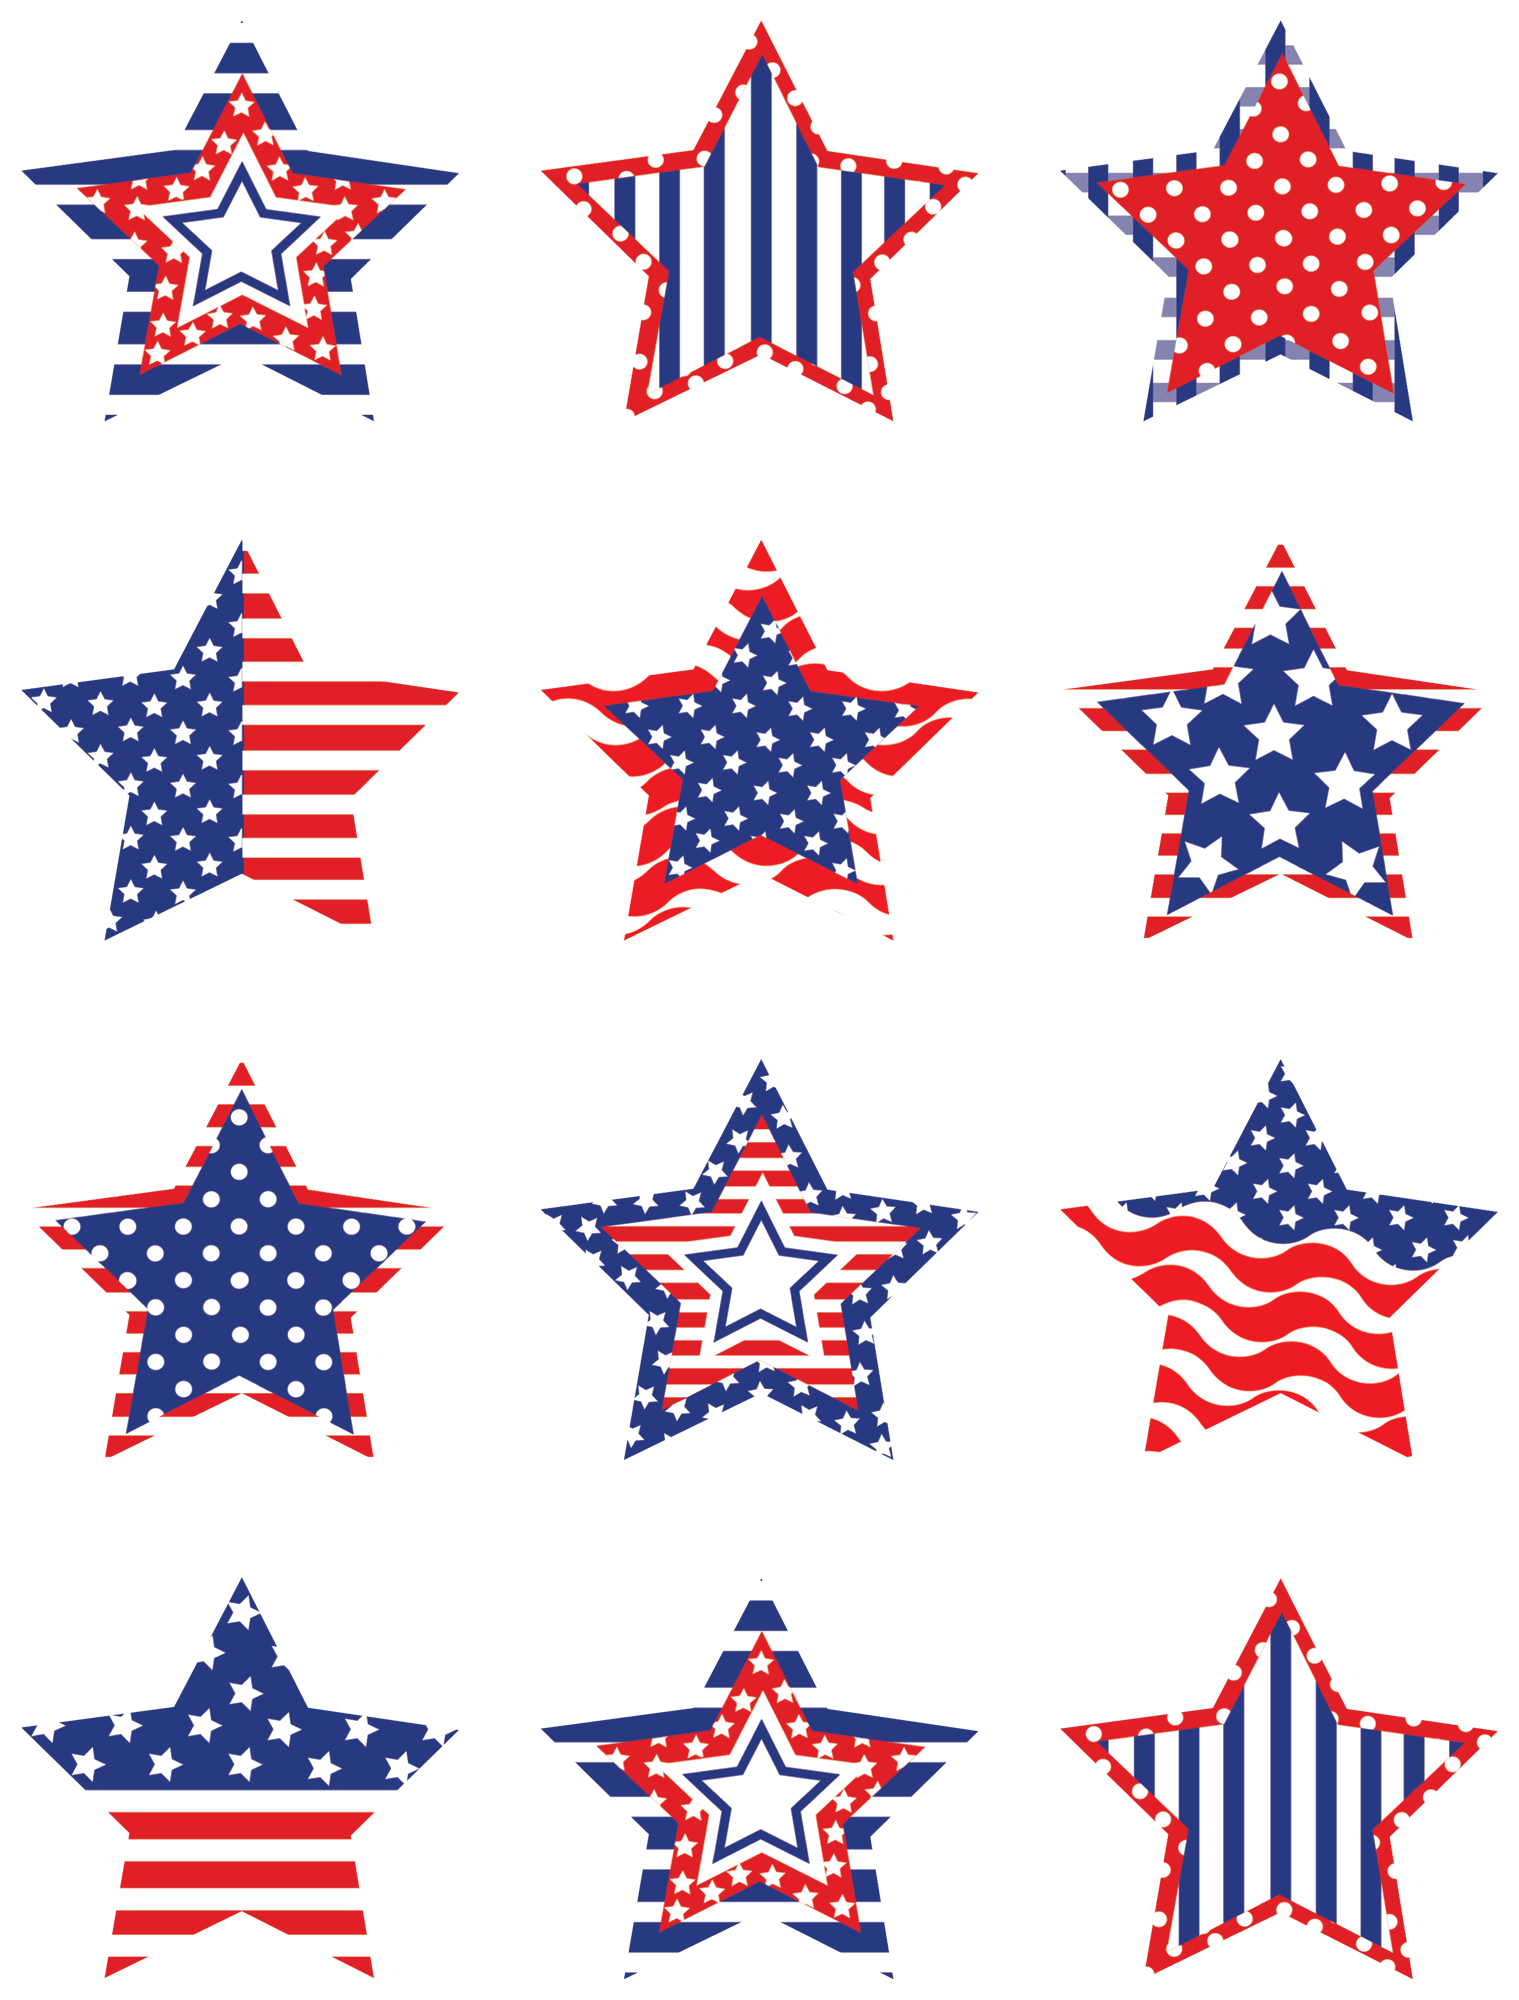 Clipart star accent. Patriotic stars mini accents